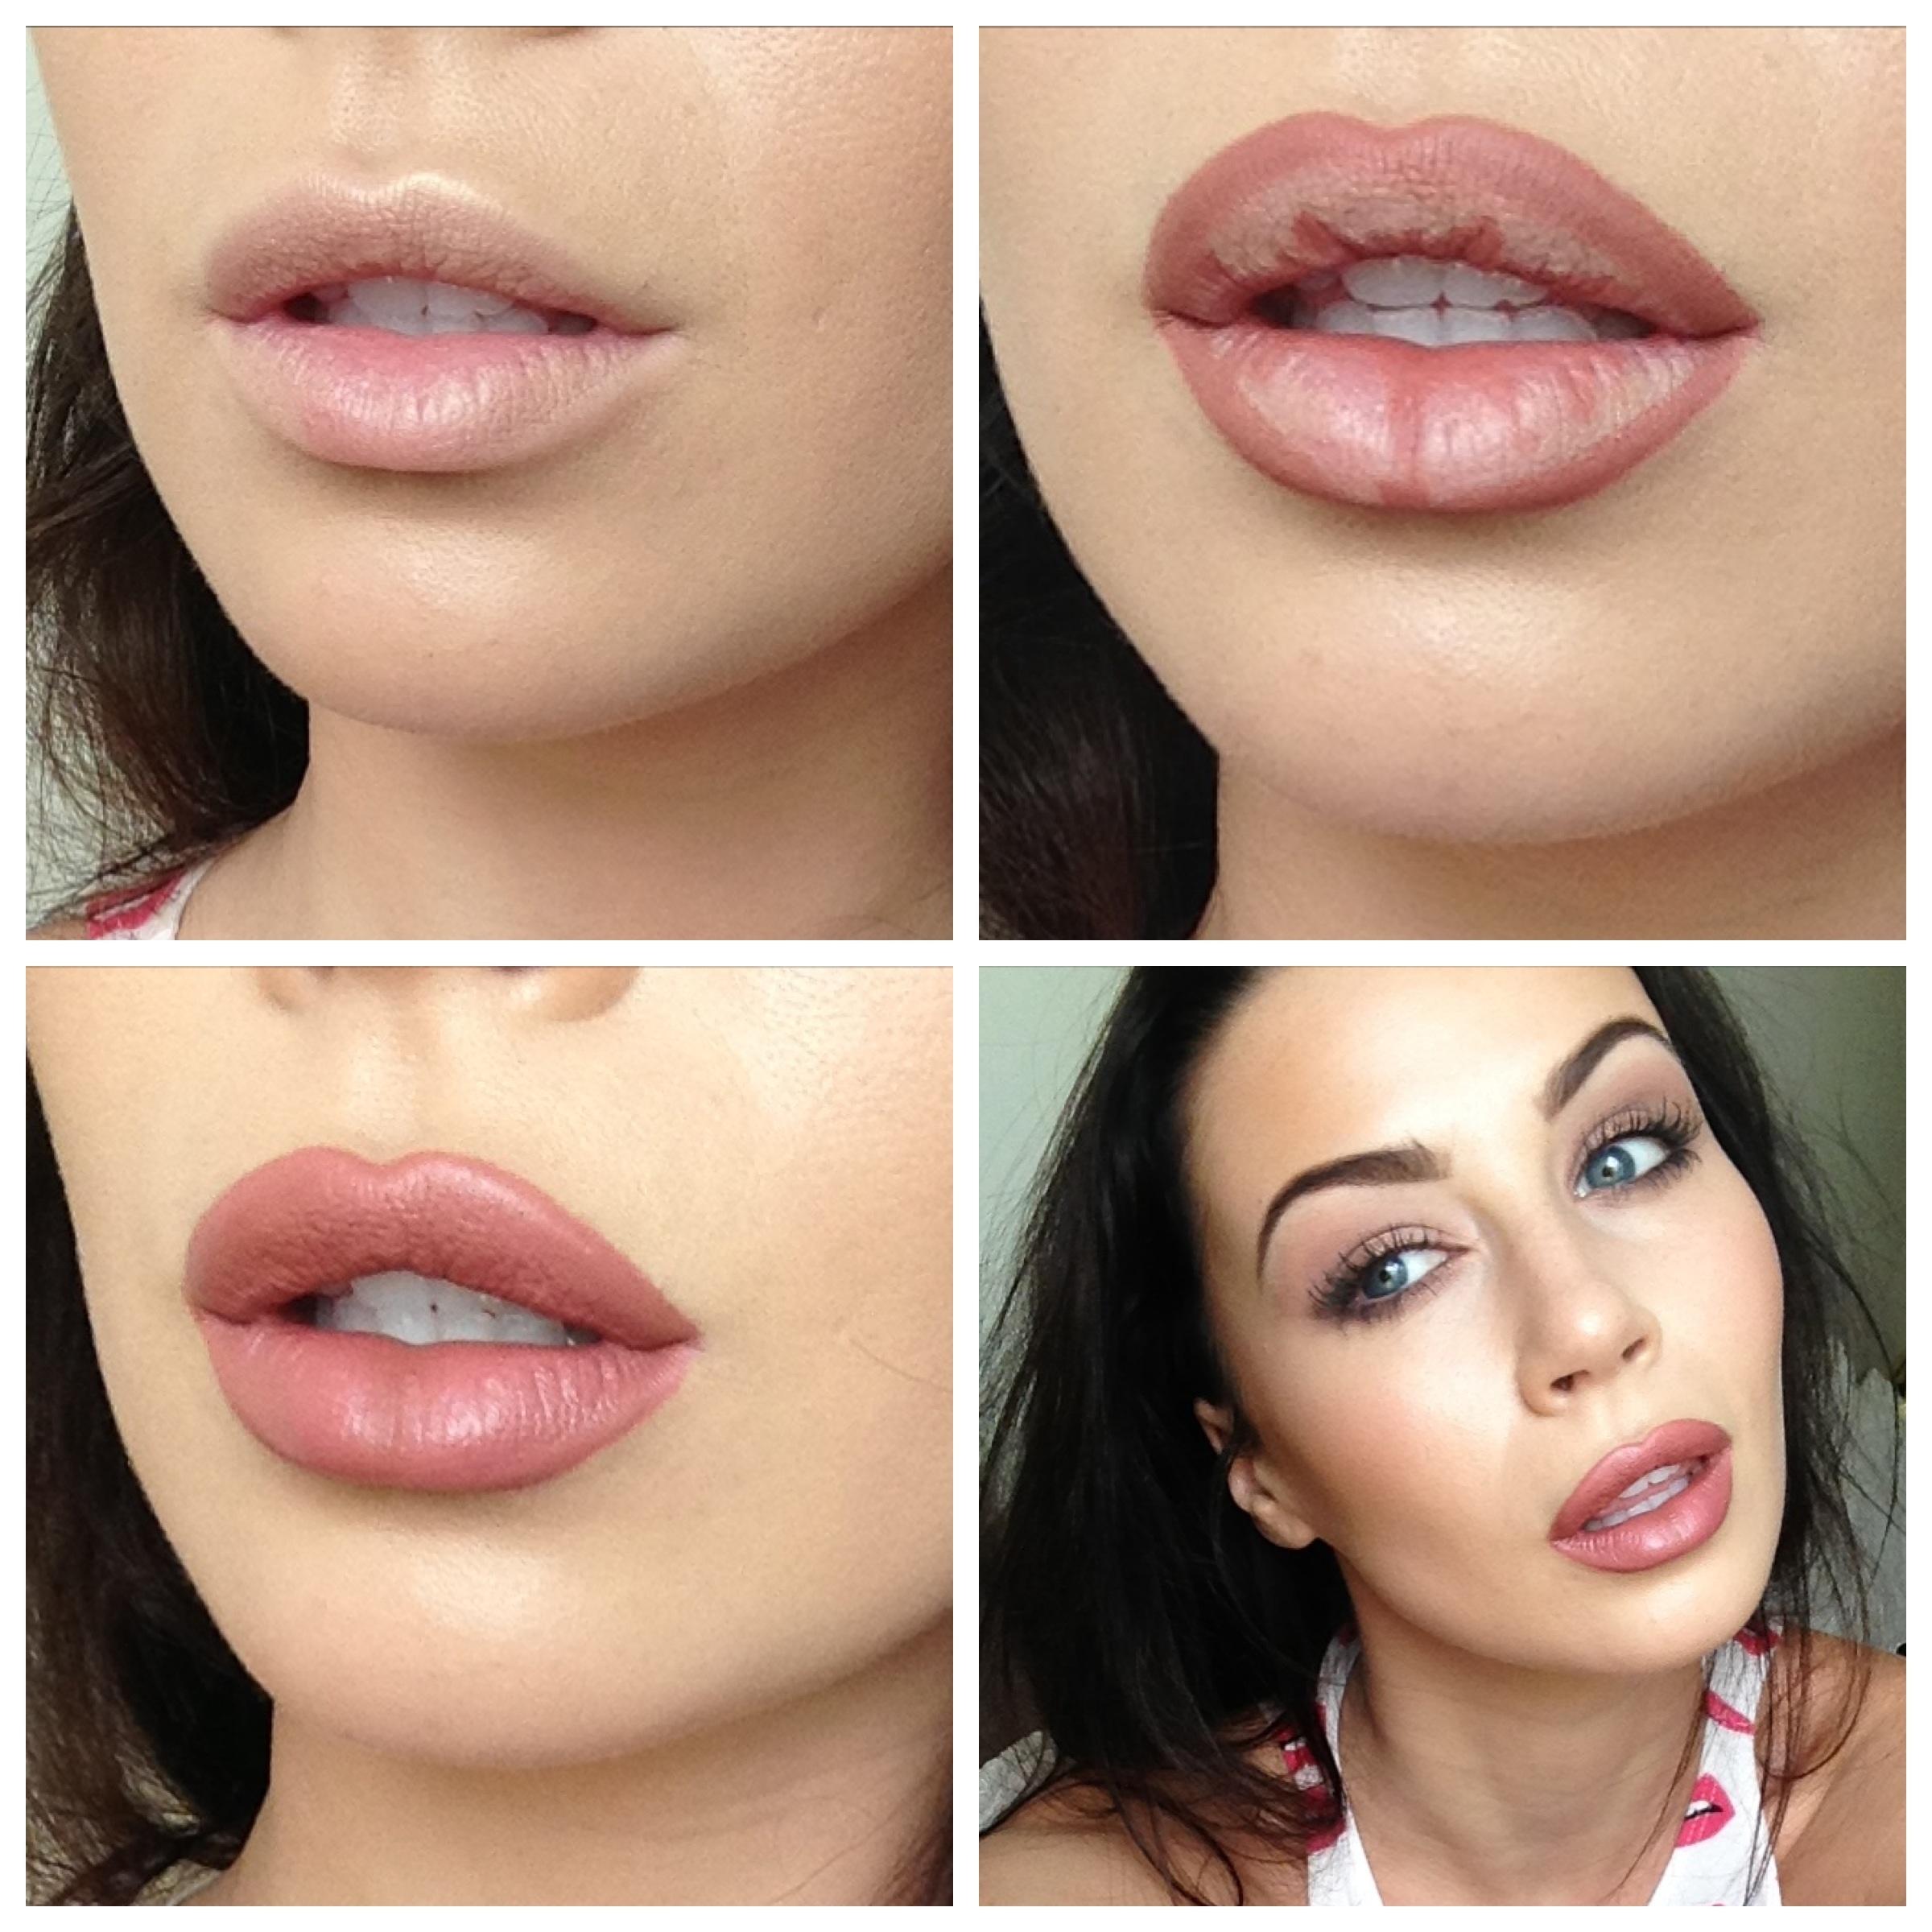 Kylie Jenner Logo Lips Google Search: Kylie Jenner Inspired Lipstick Tutorial